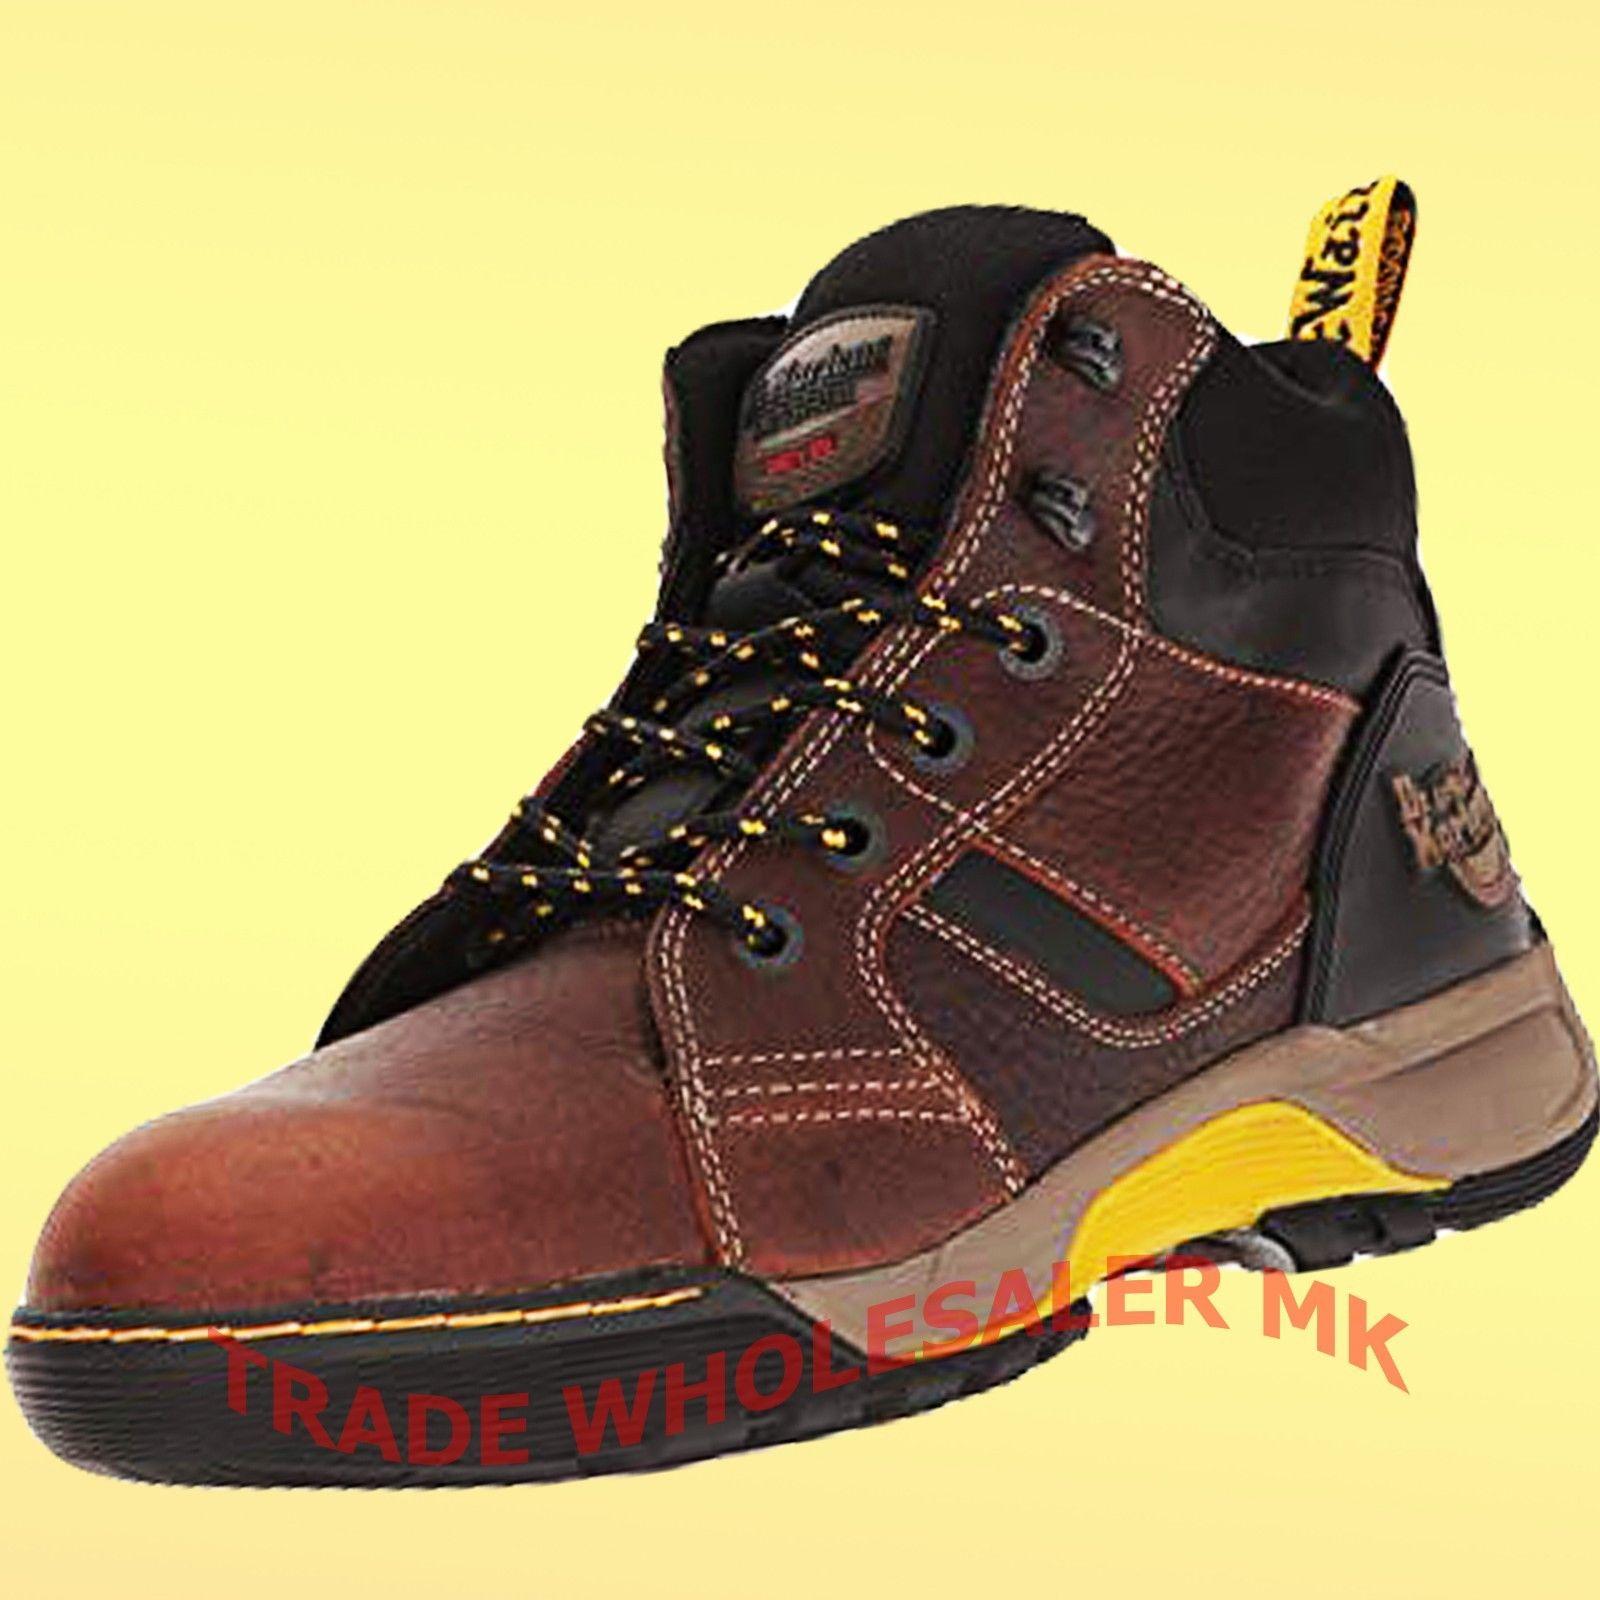 dr martens steel toe cap shoes